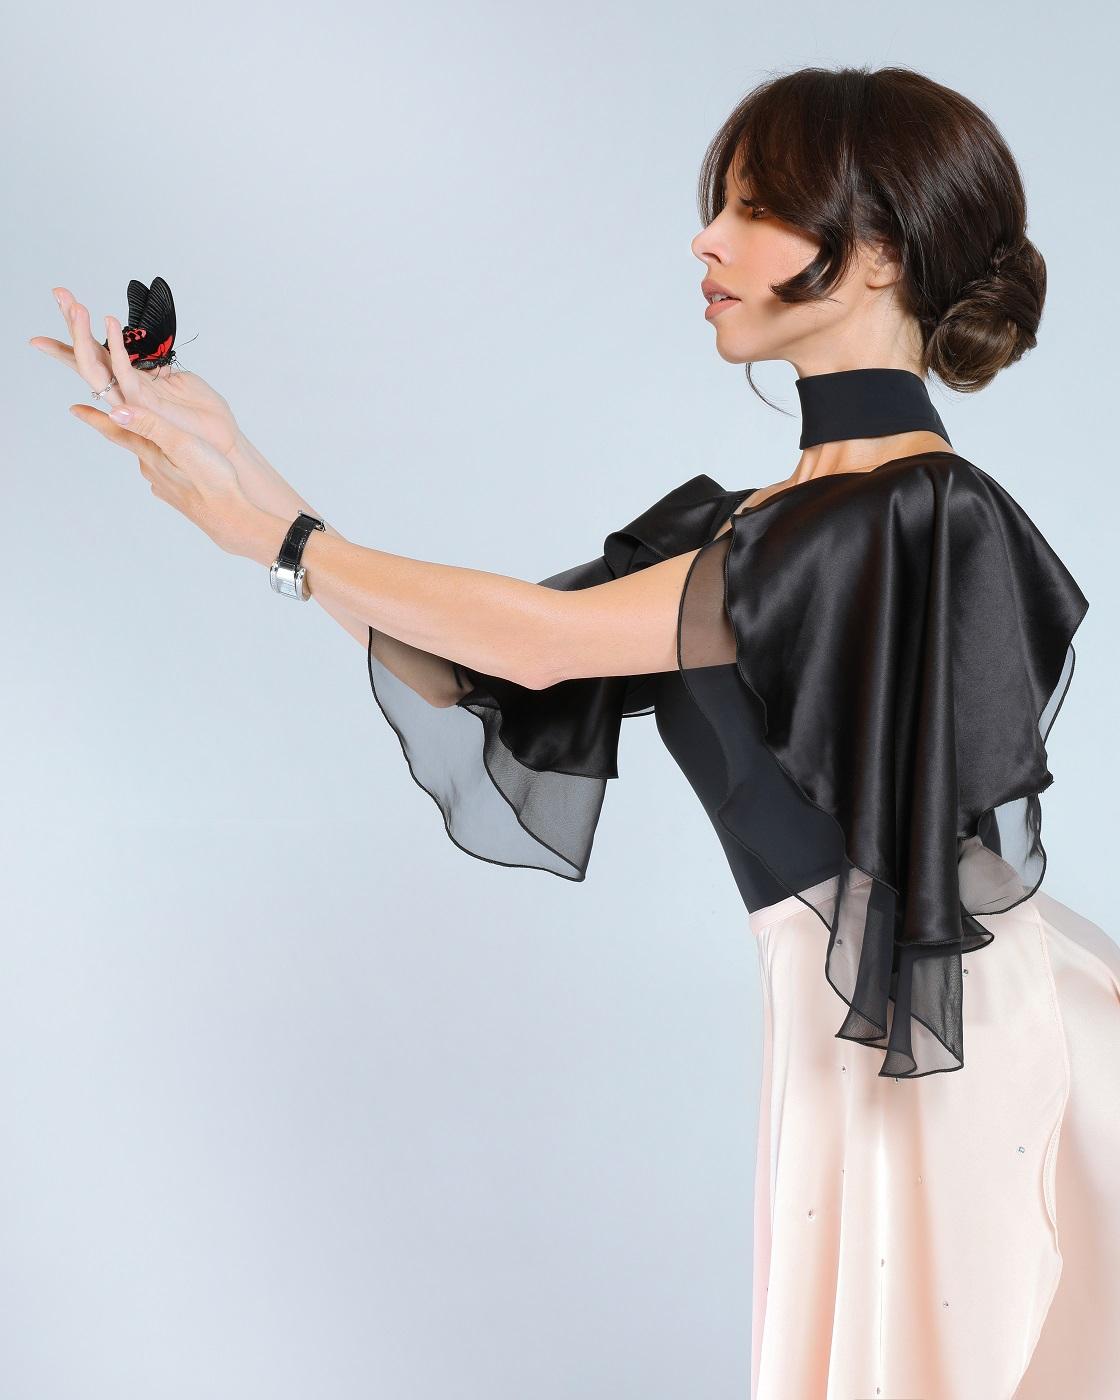 Катерина Кухар изобрела крылья бабочки-Фото 2